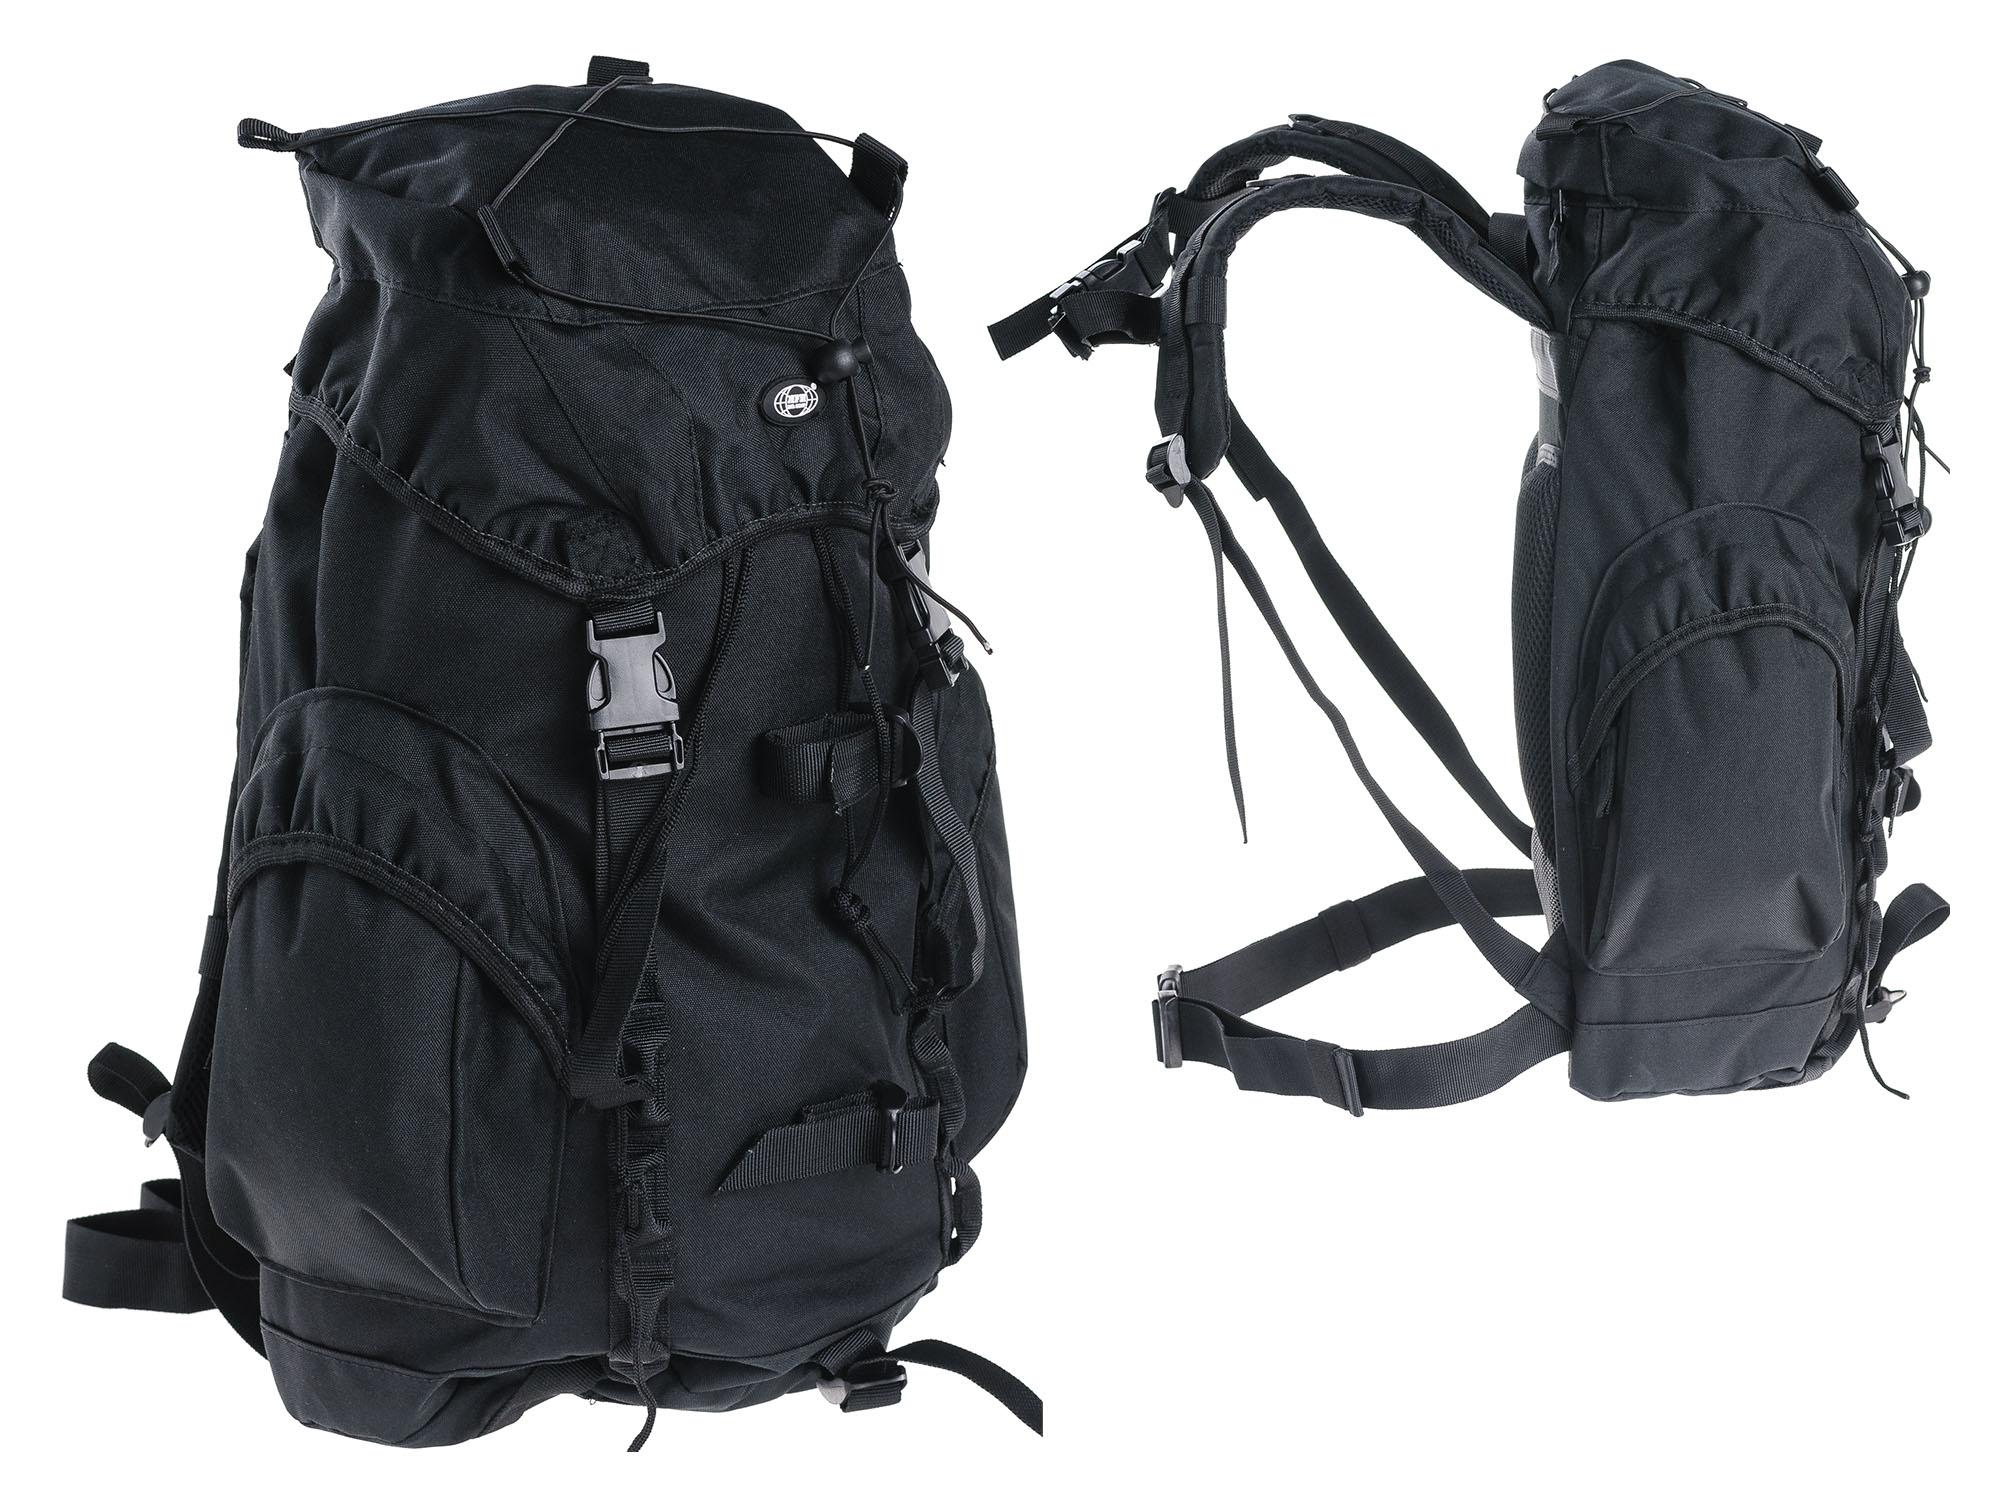 Taktický BATOH Recon II 1200D 25 L - Black